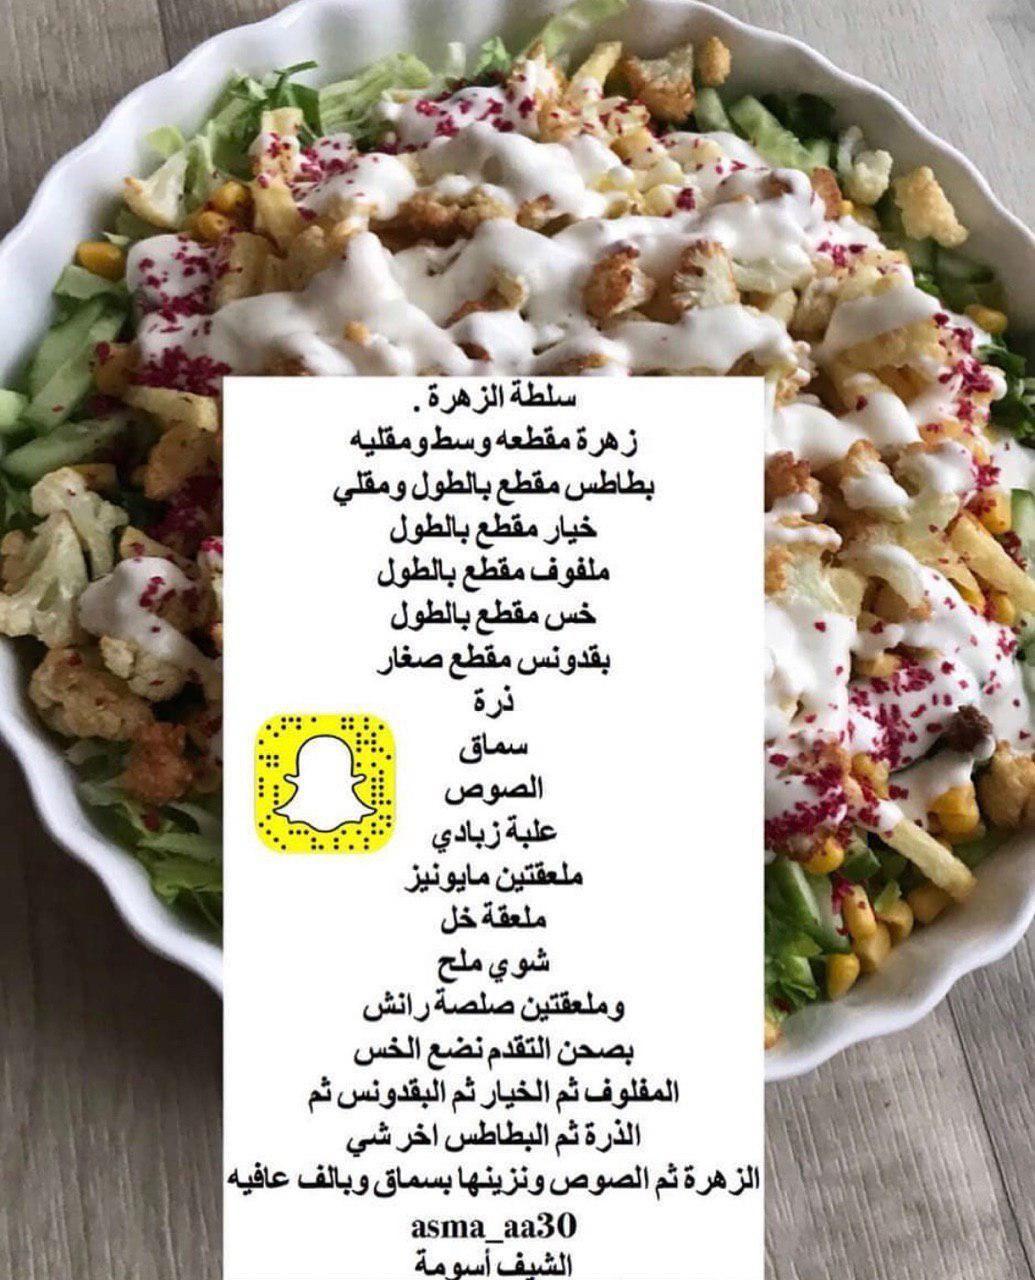 سلطة الزهرة Cookout Food Health Facts Food Save Food